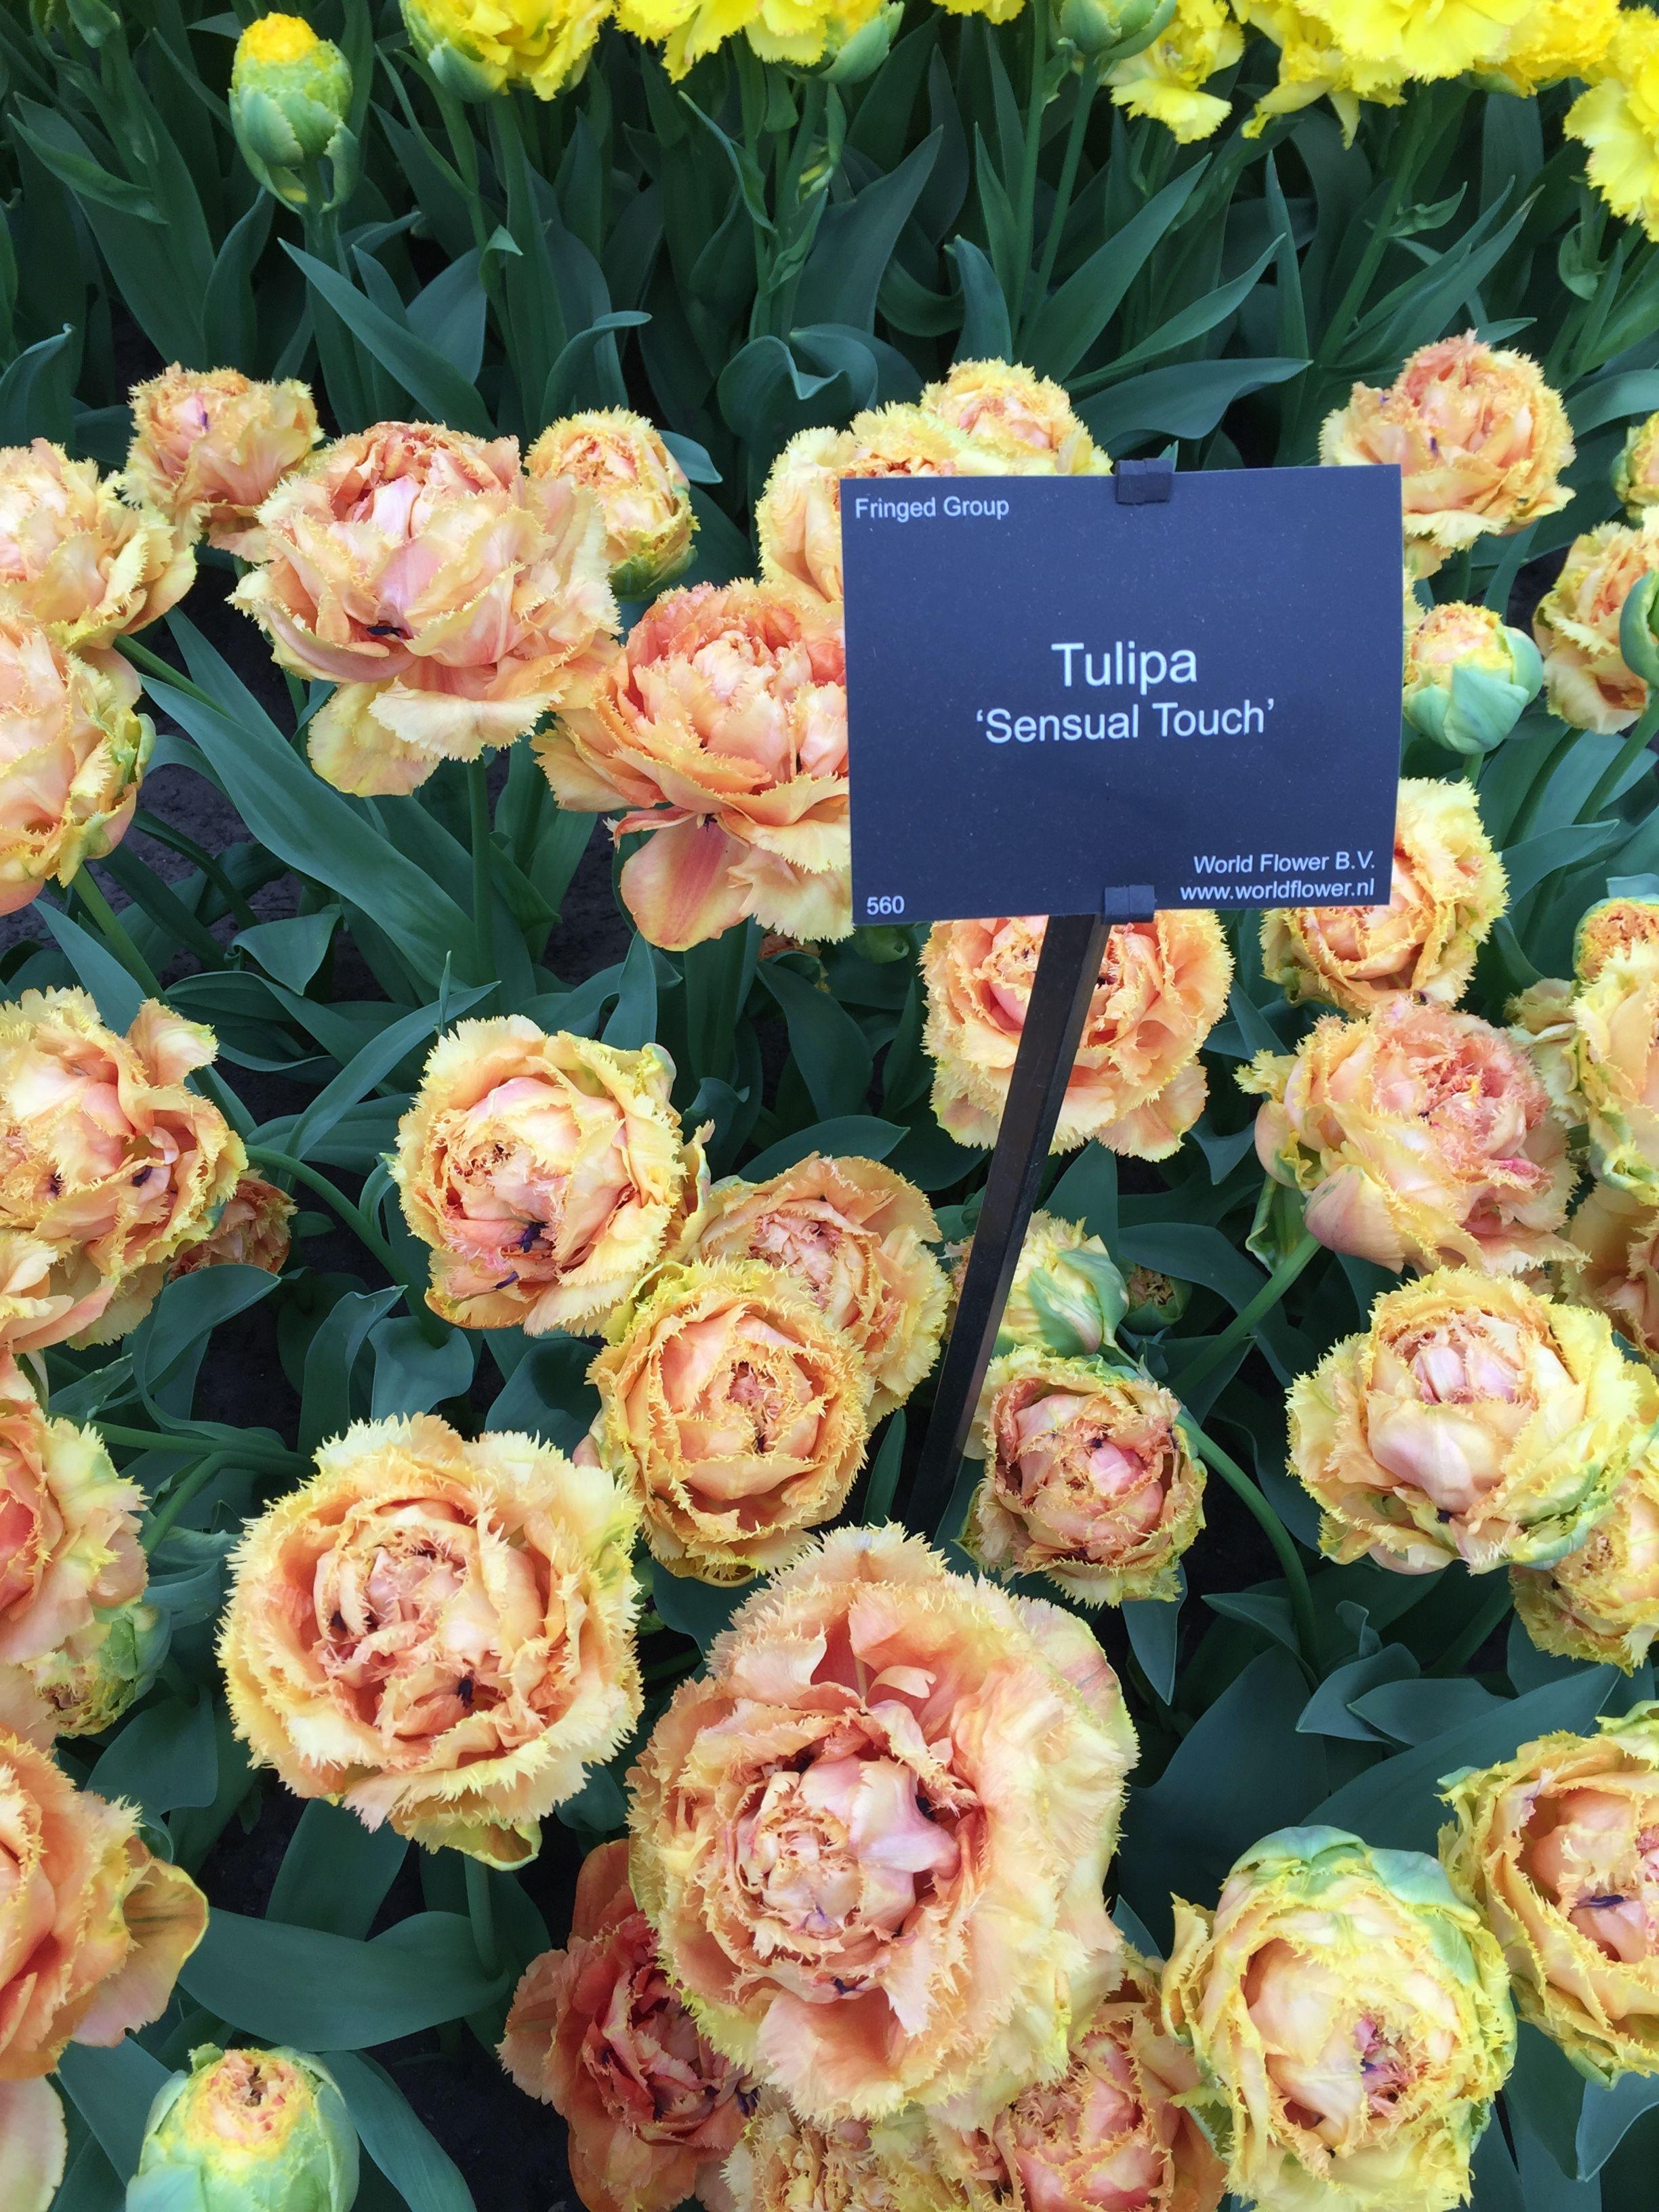 12 Things You Should Know Before You Visit Keukenhof Tulip Garden Tulips Garden Indoor Gardening Kit Garden Services